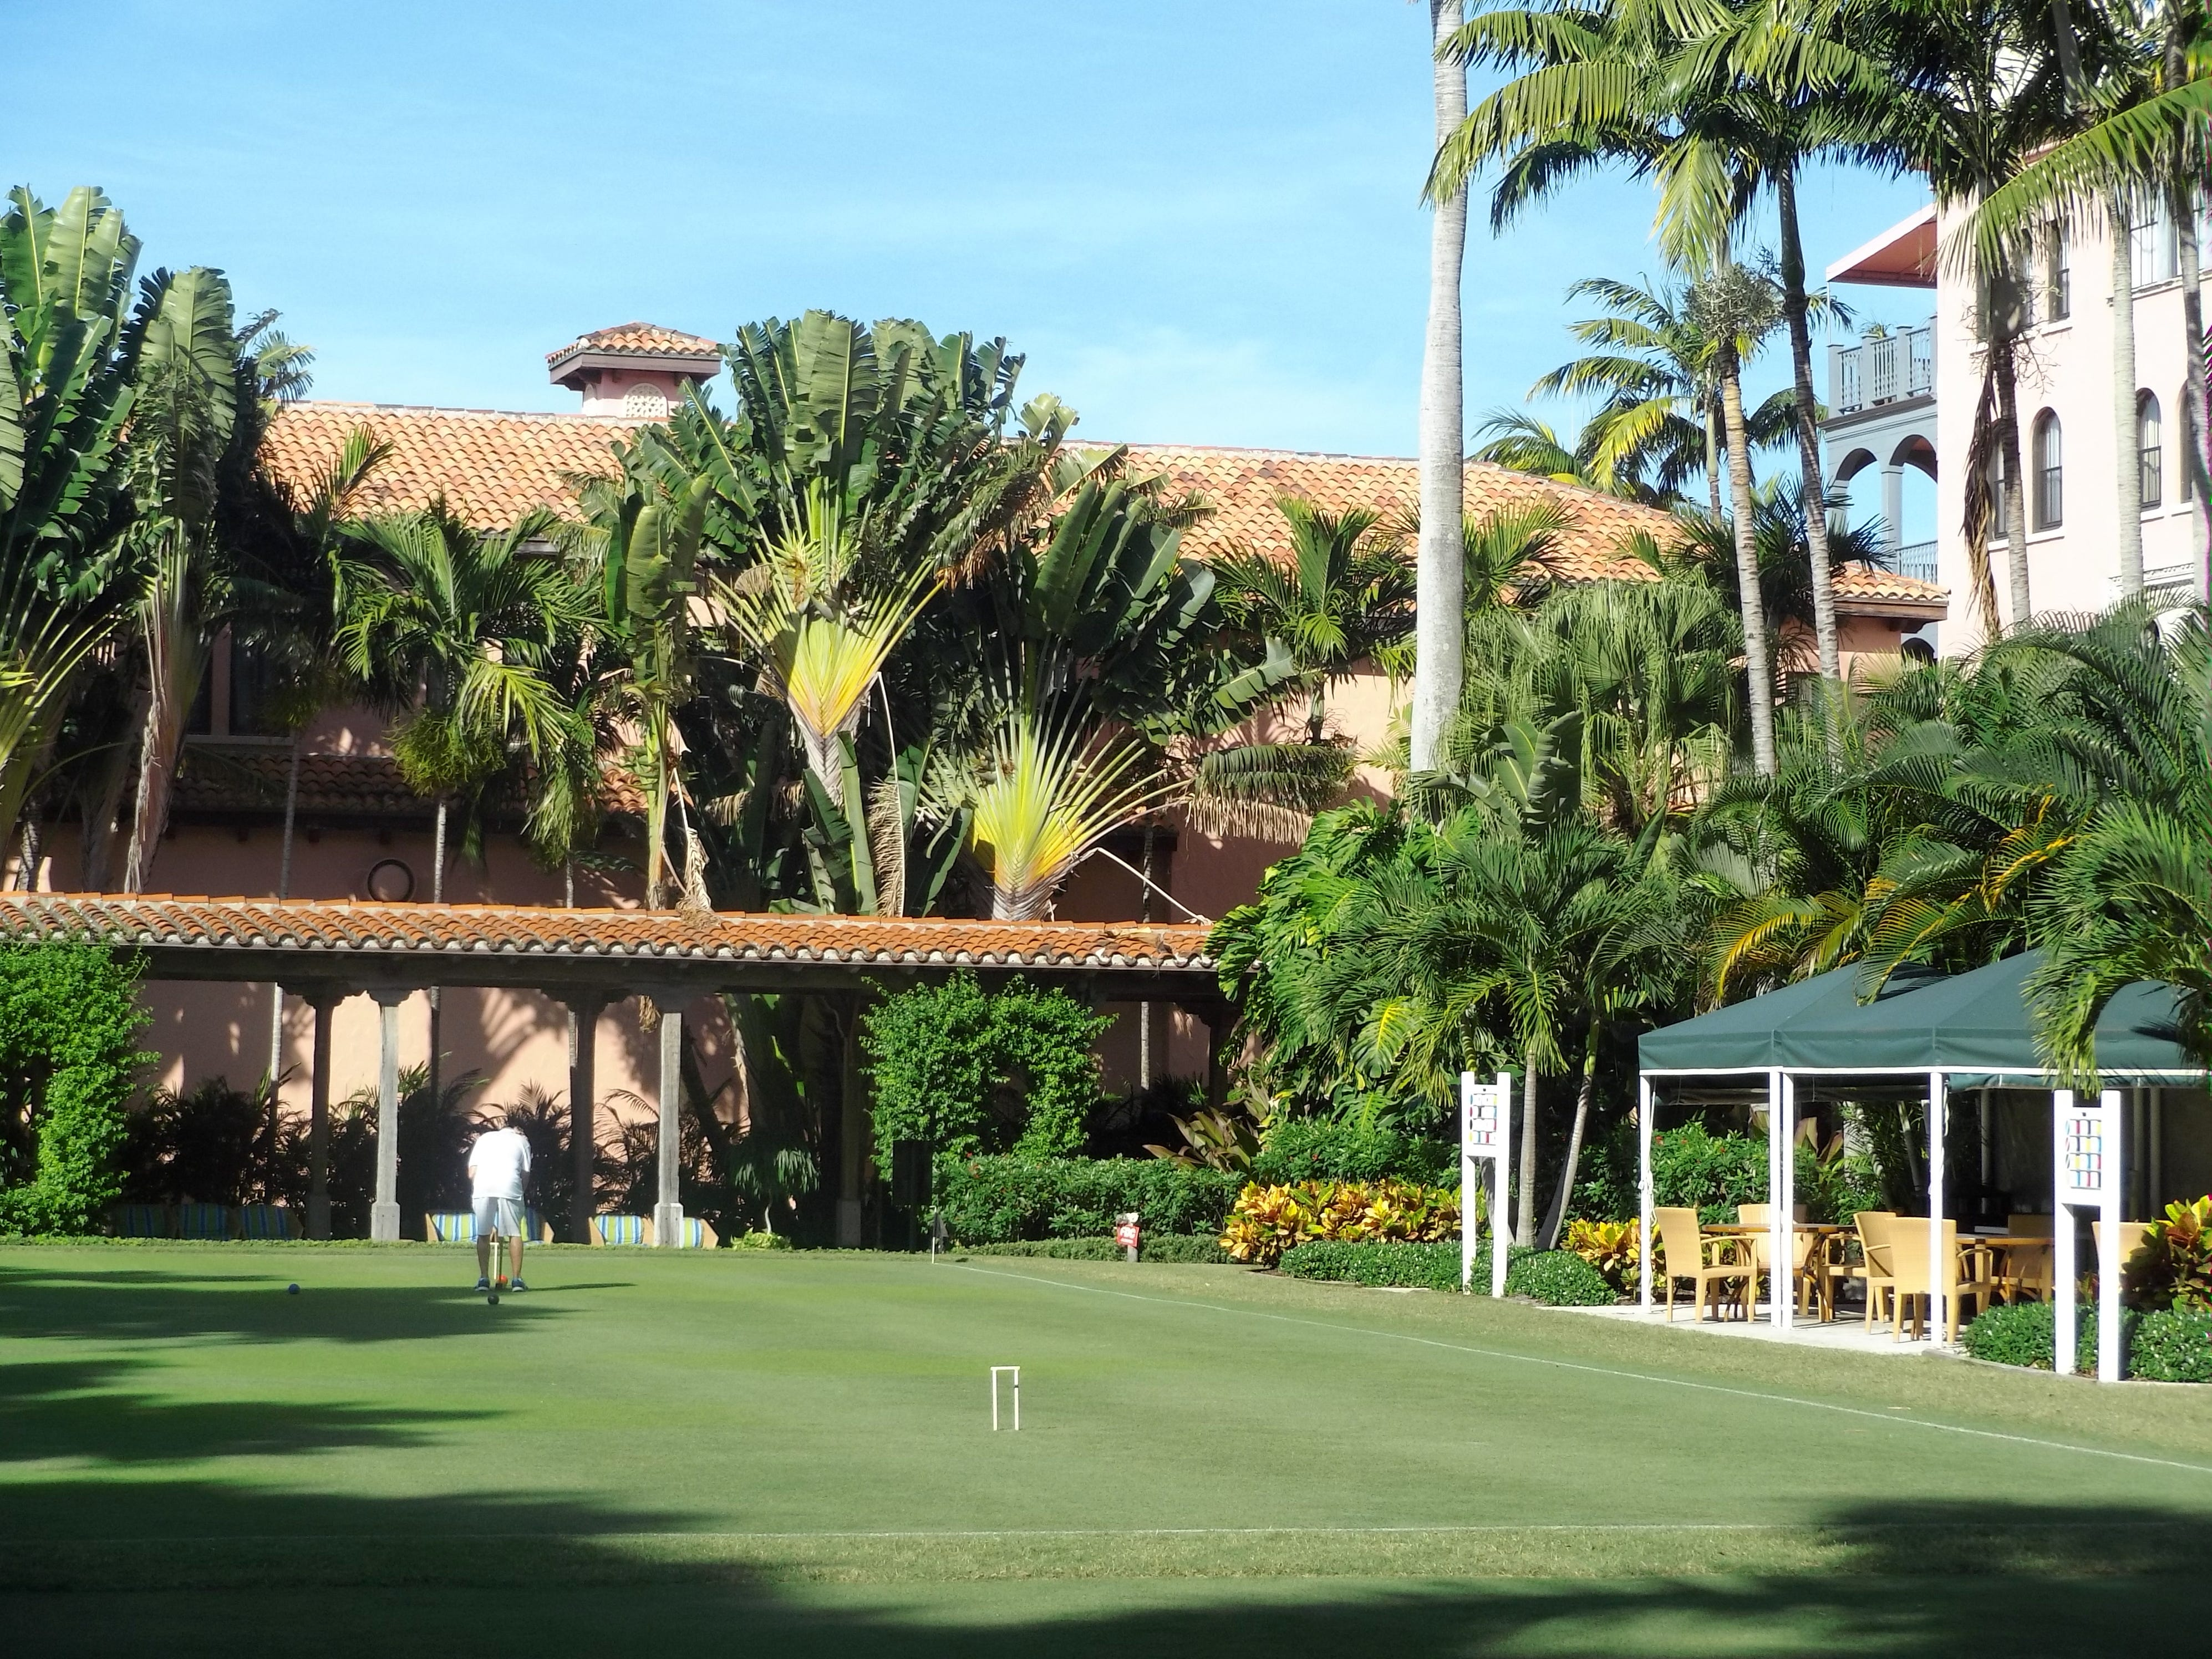 Playing croquet at Boca Raton Resort & Club.